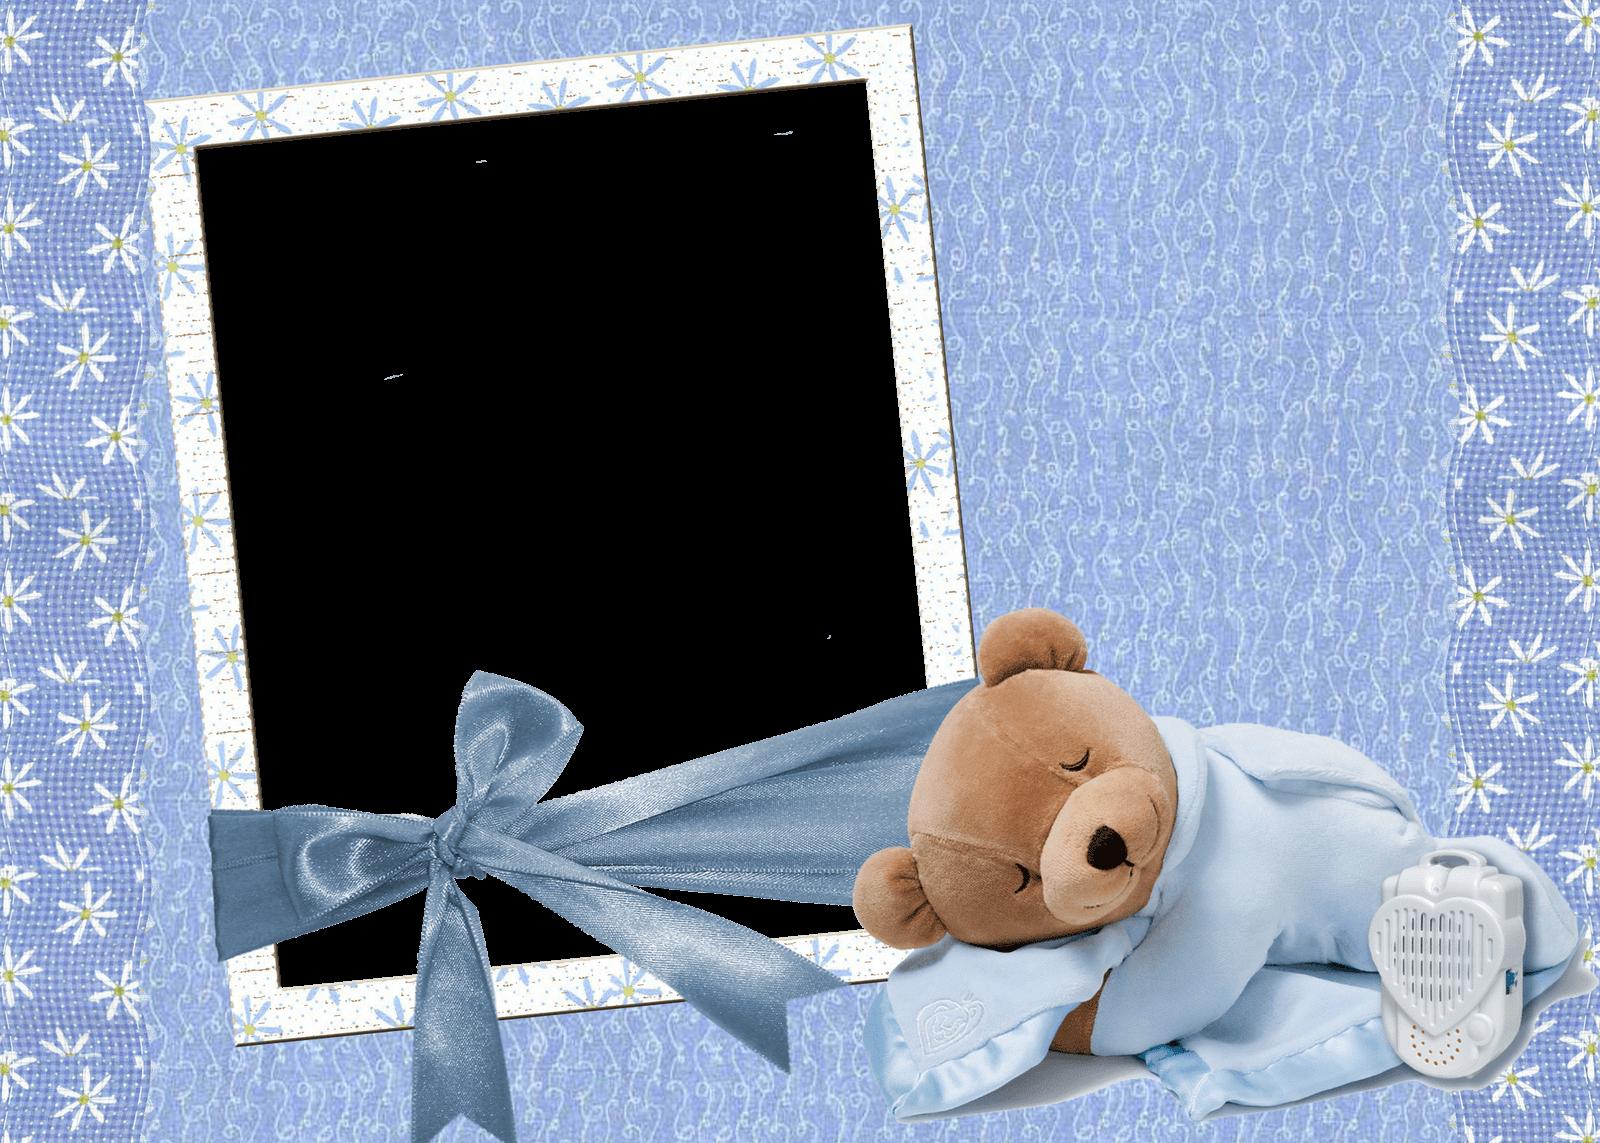 Marco Azul para foto de Bebe con Osito de Peluche | Descargar Marcos